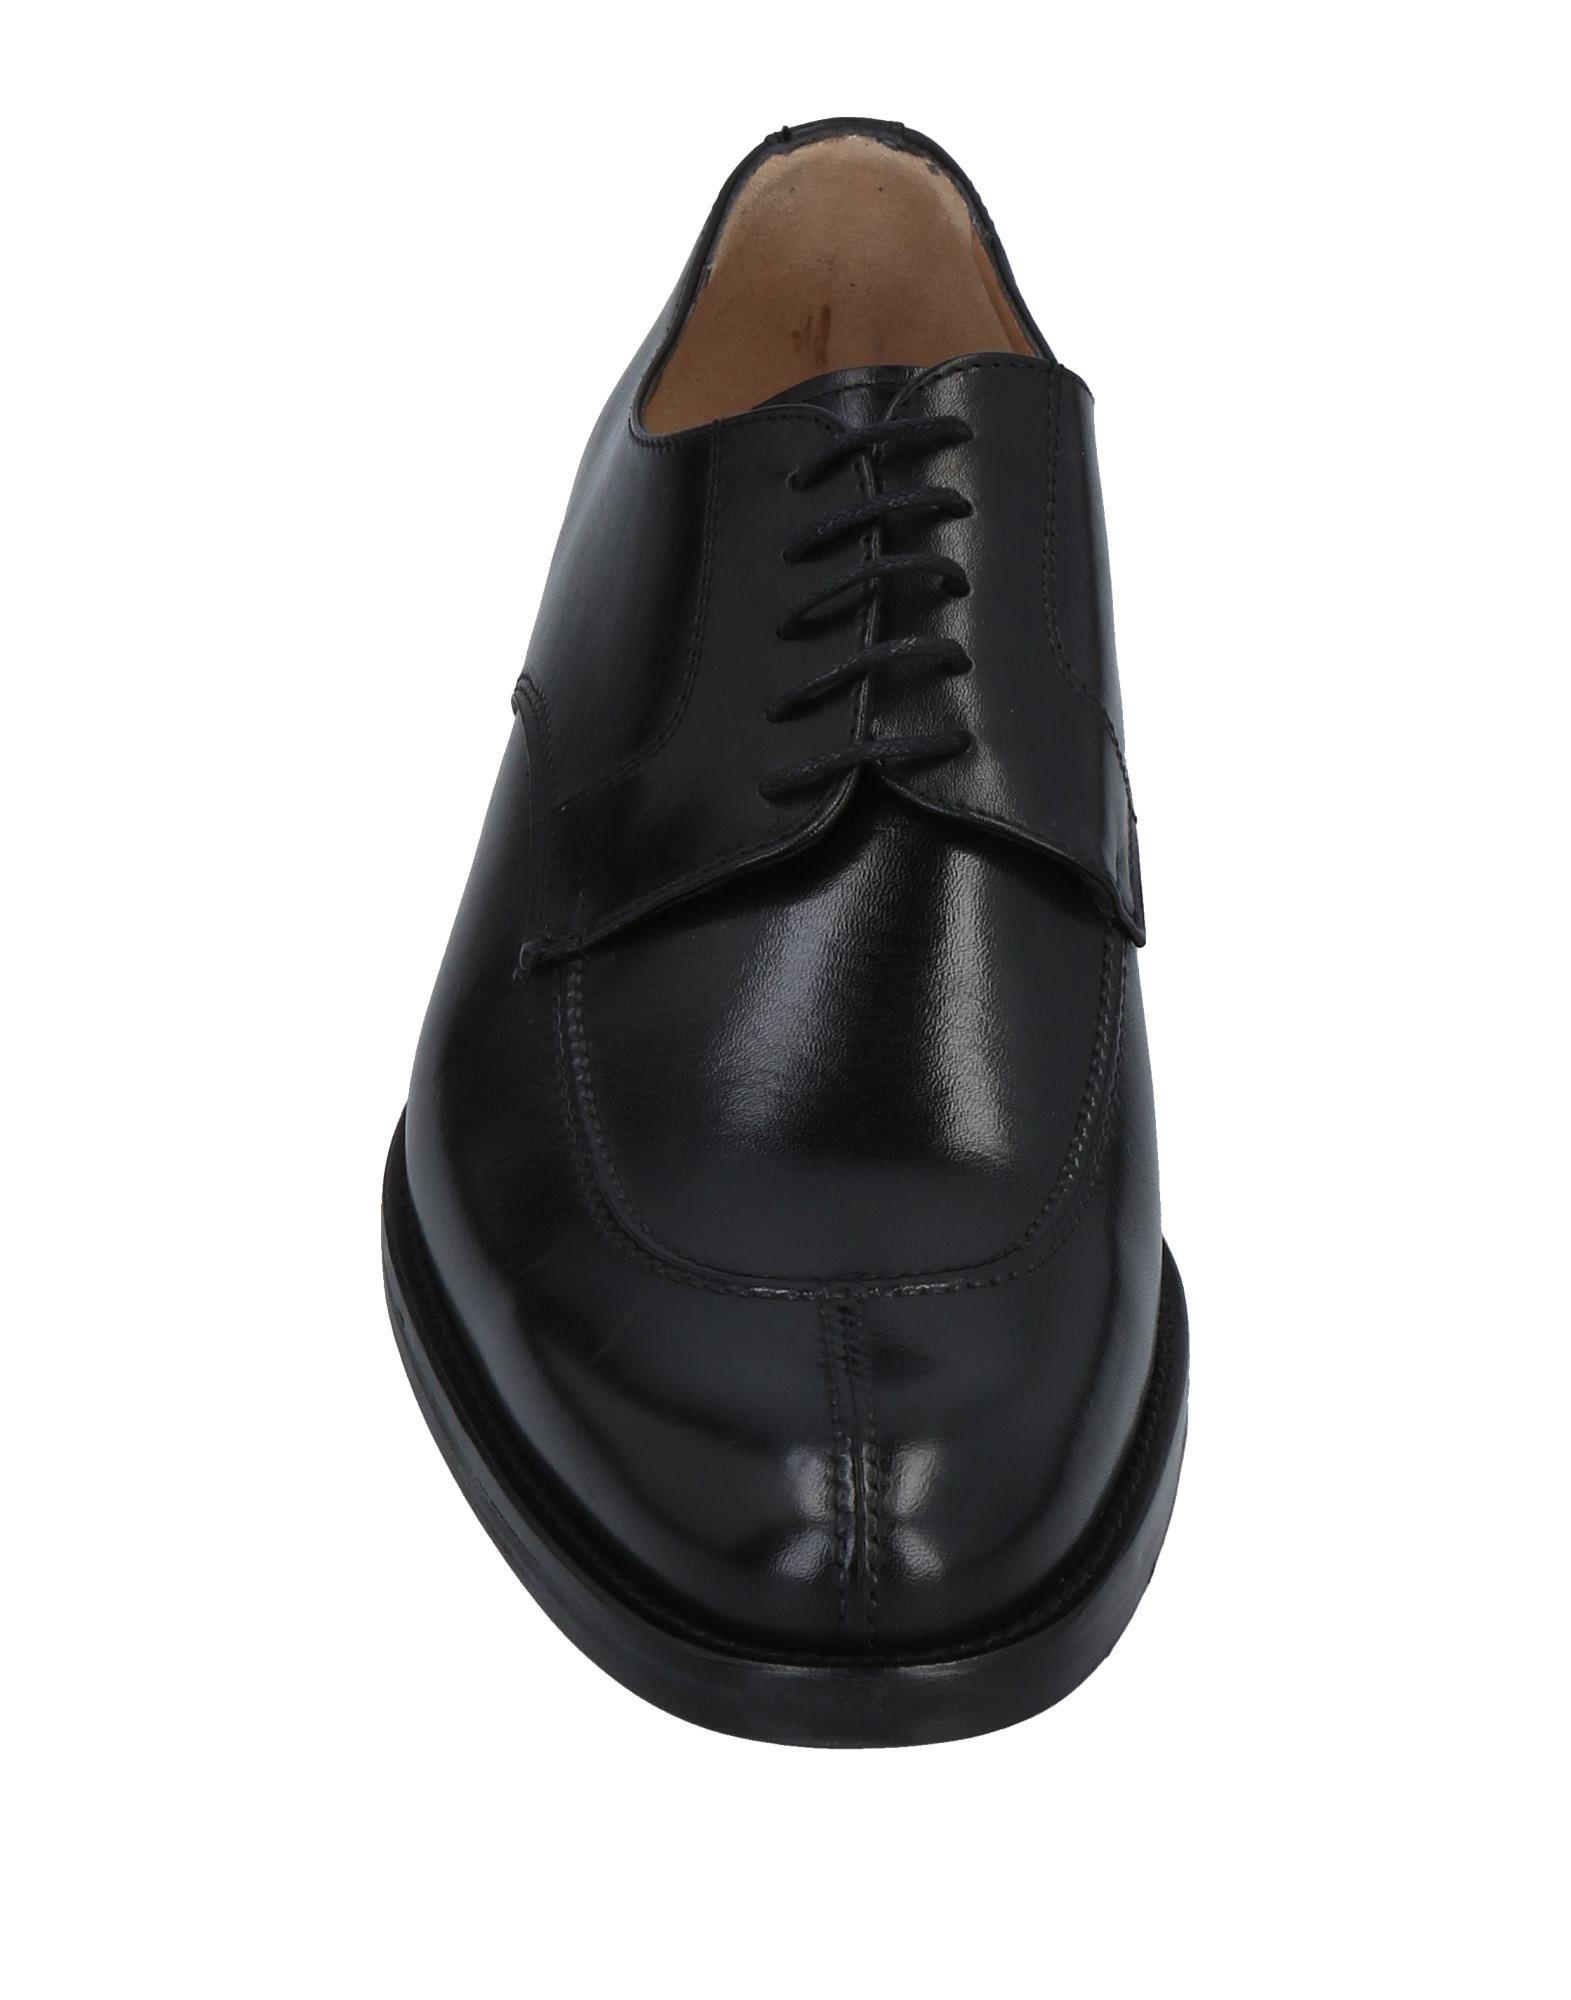 Rabatt echte Schnürschuhe Schuhe Il Calzolaio Schnürschuhe echte Herren  11477492RM 7e6eba